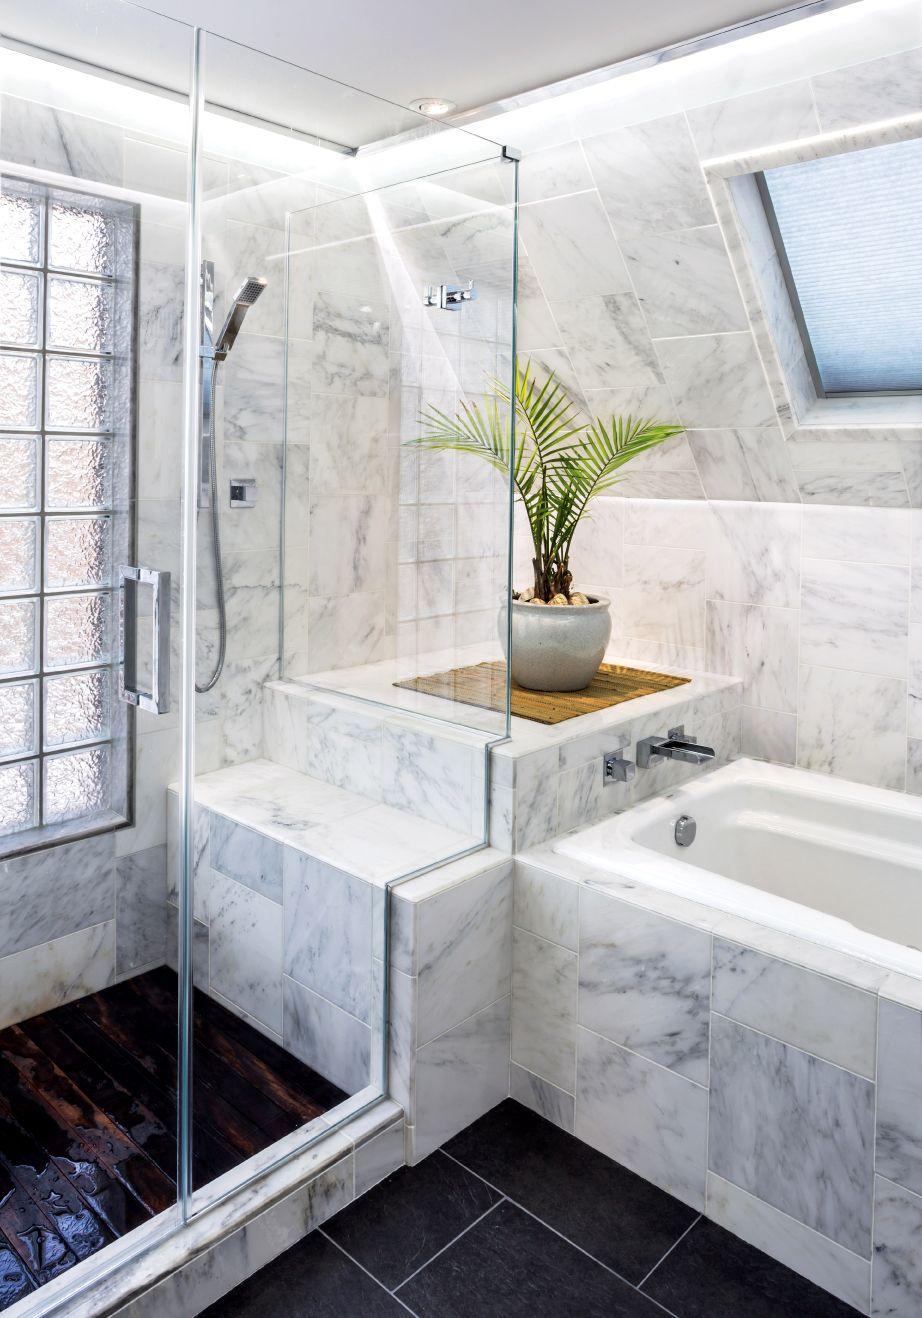 Glass block bathroom bathroom - Glass Block Windows Bathroom Google Search